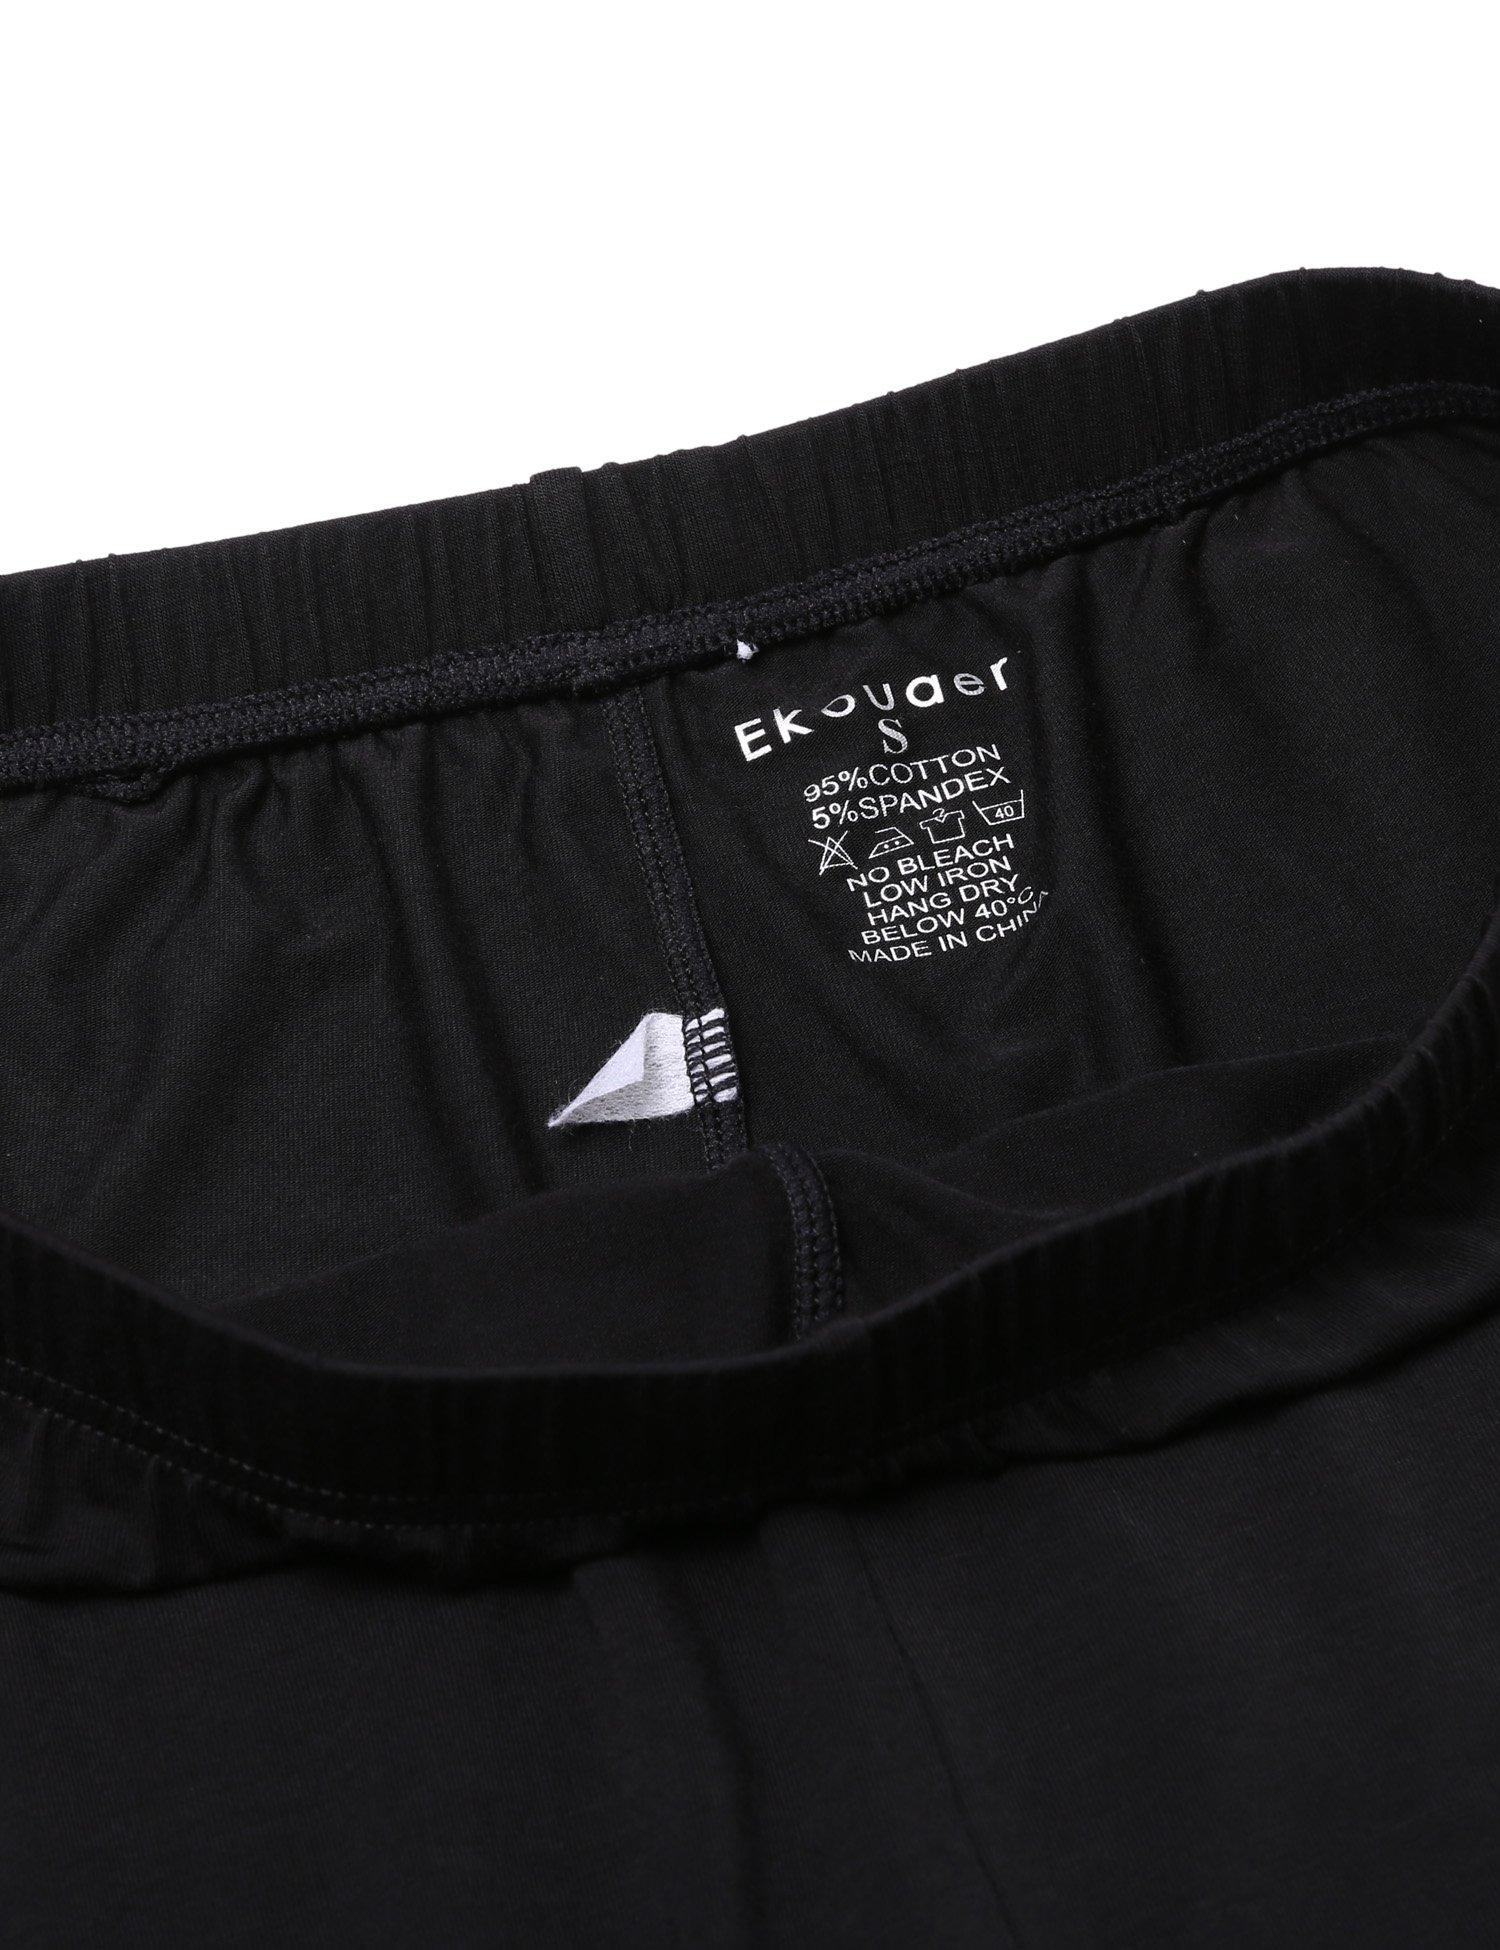 Ekouaer Women Thermal Underwear Set Solid V-Neck Long Sleeve Top and Long Pants Bottom Sleepwear by Ekouaer (Image #9)